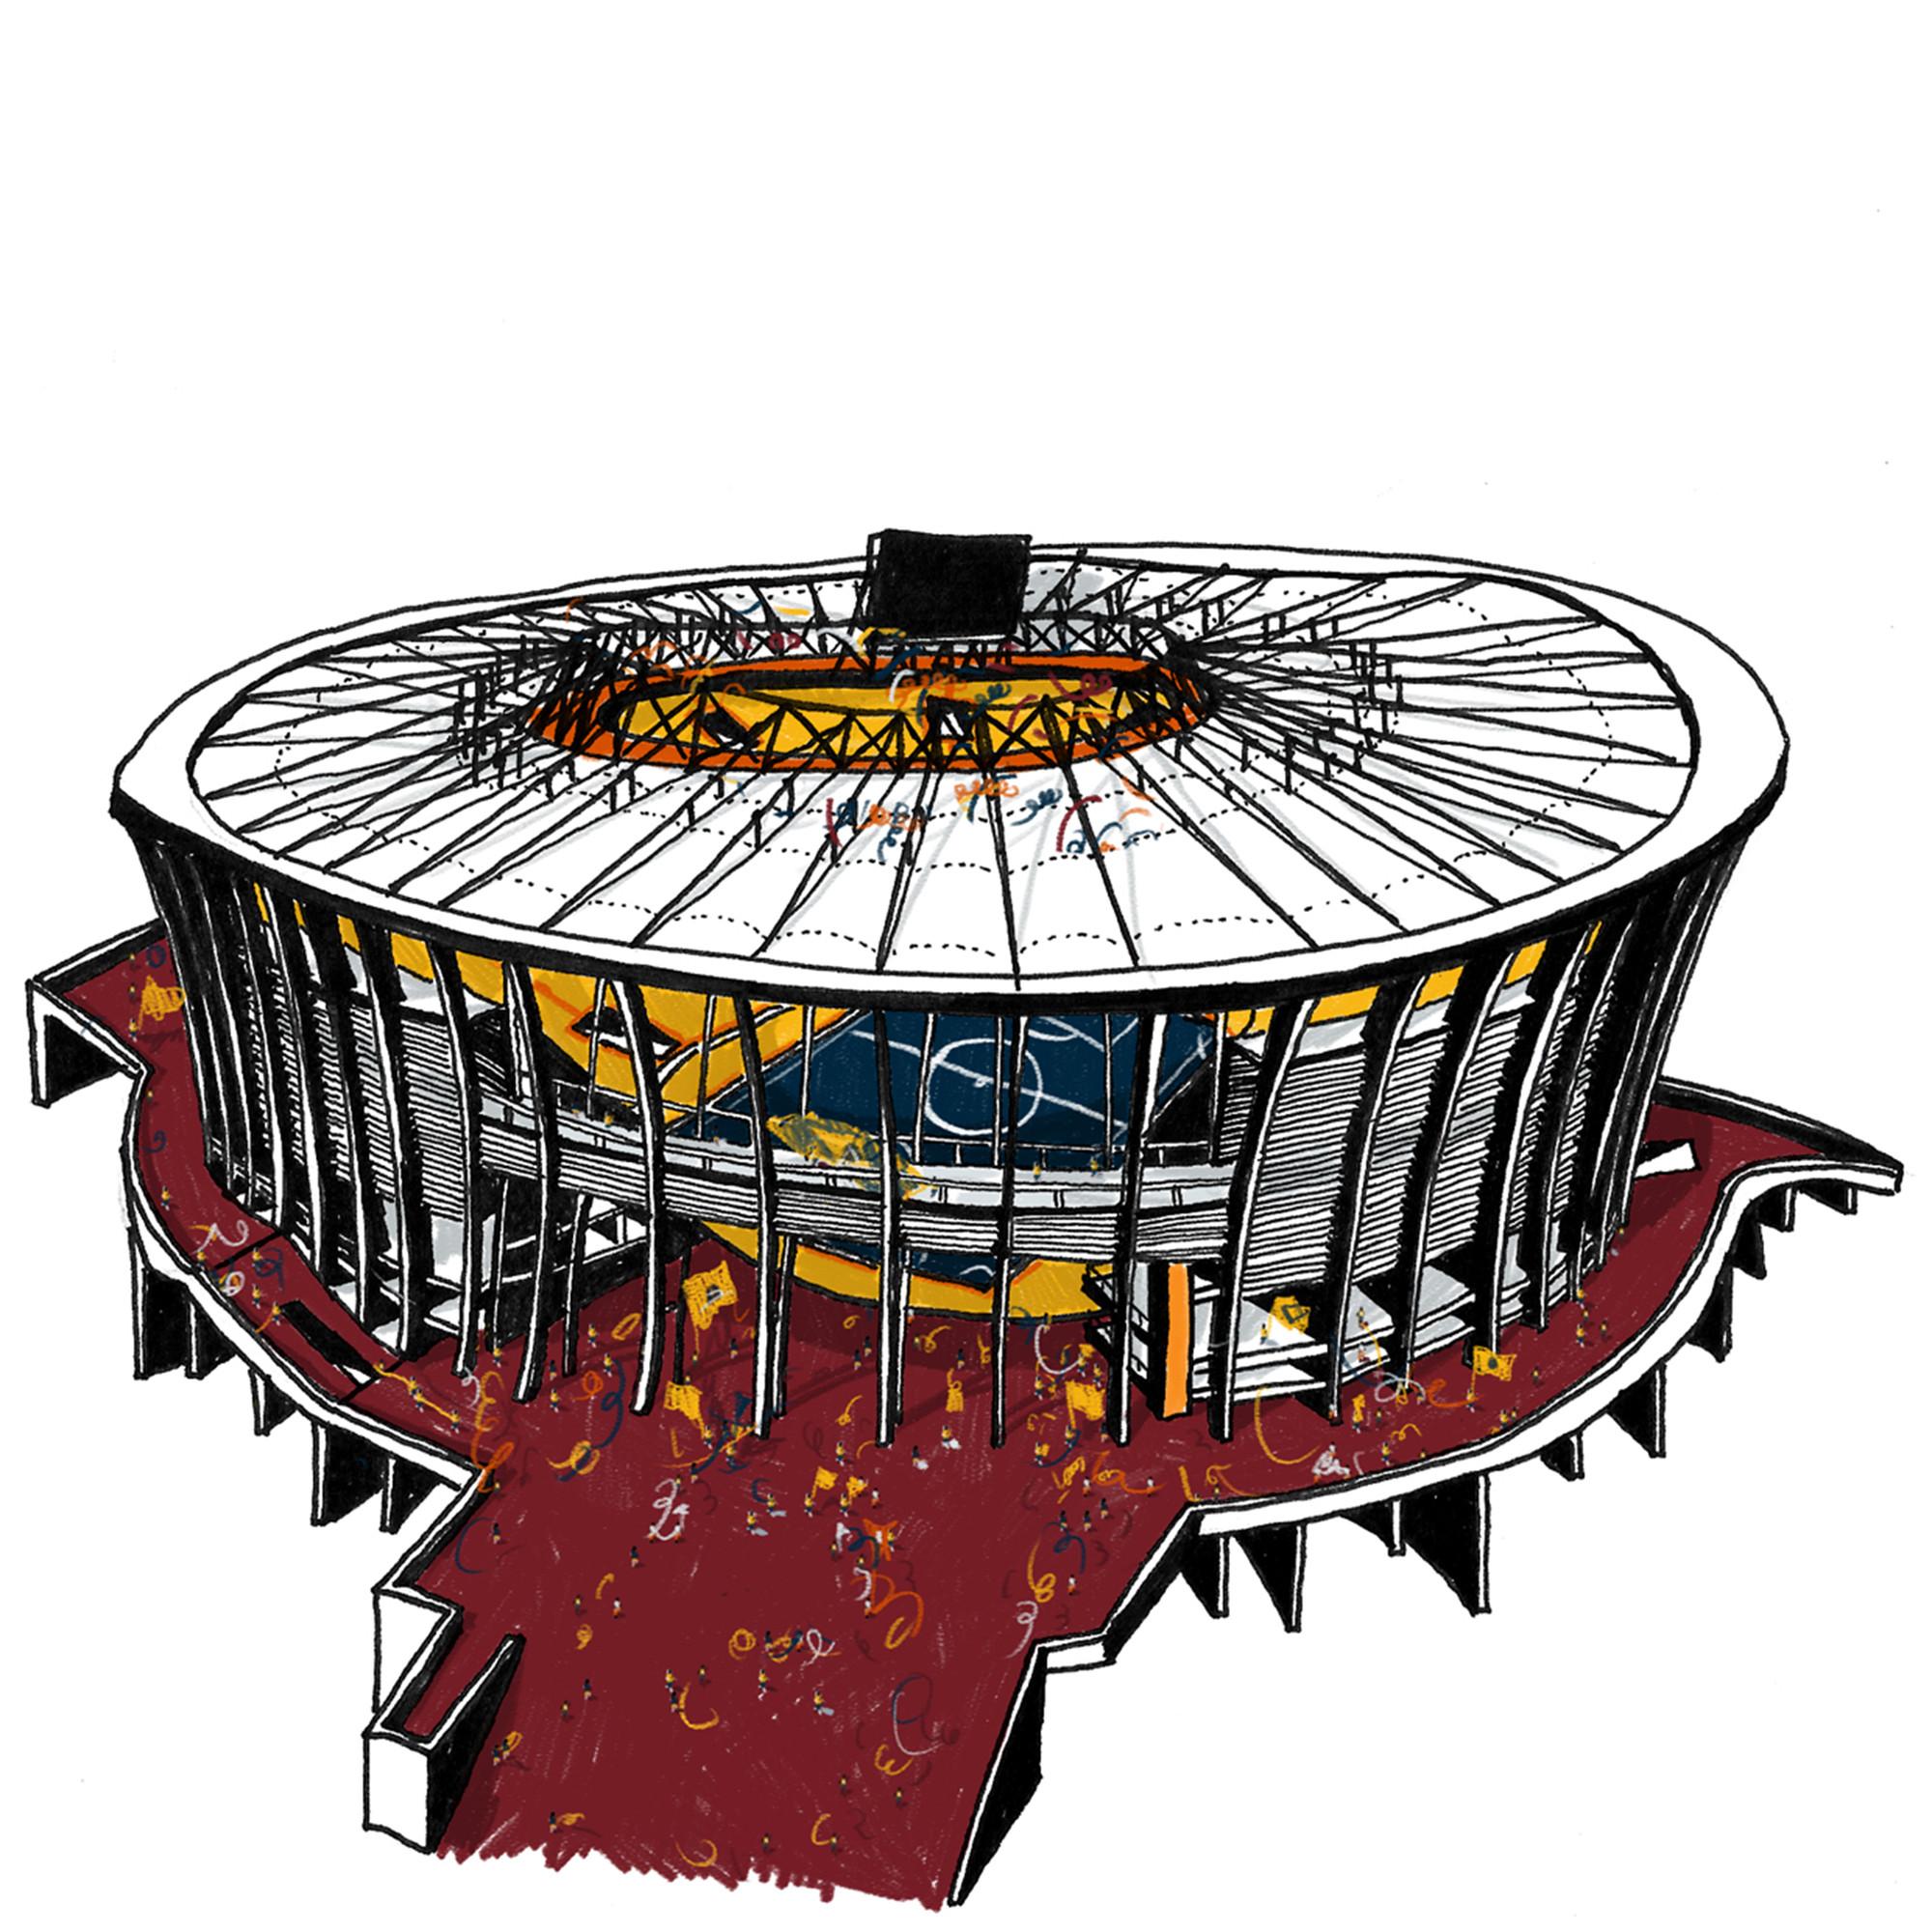 Arena Fonte Nova - Salvador. Imagen Cortesía de Vapor 324